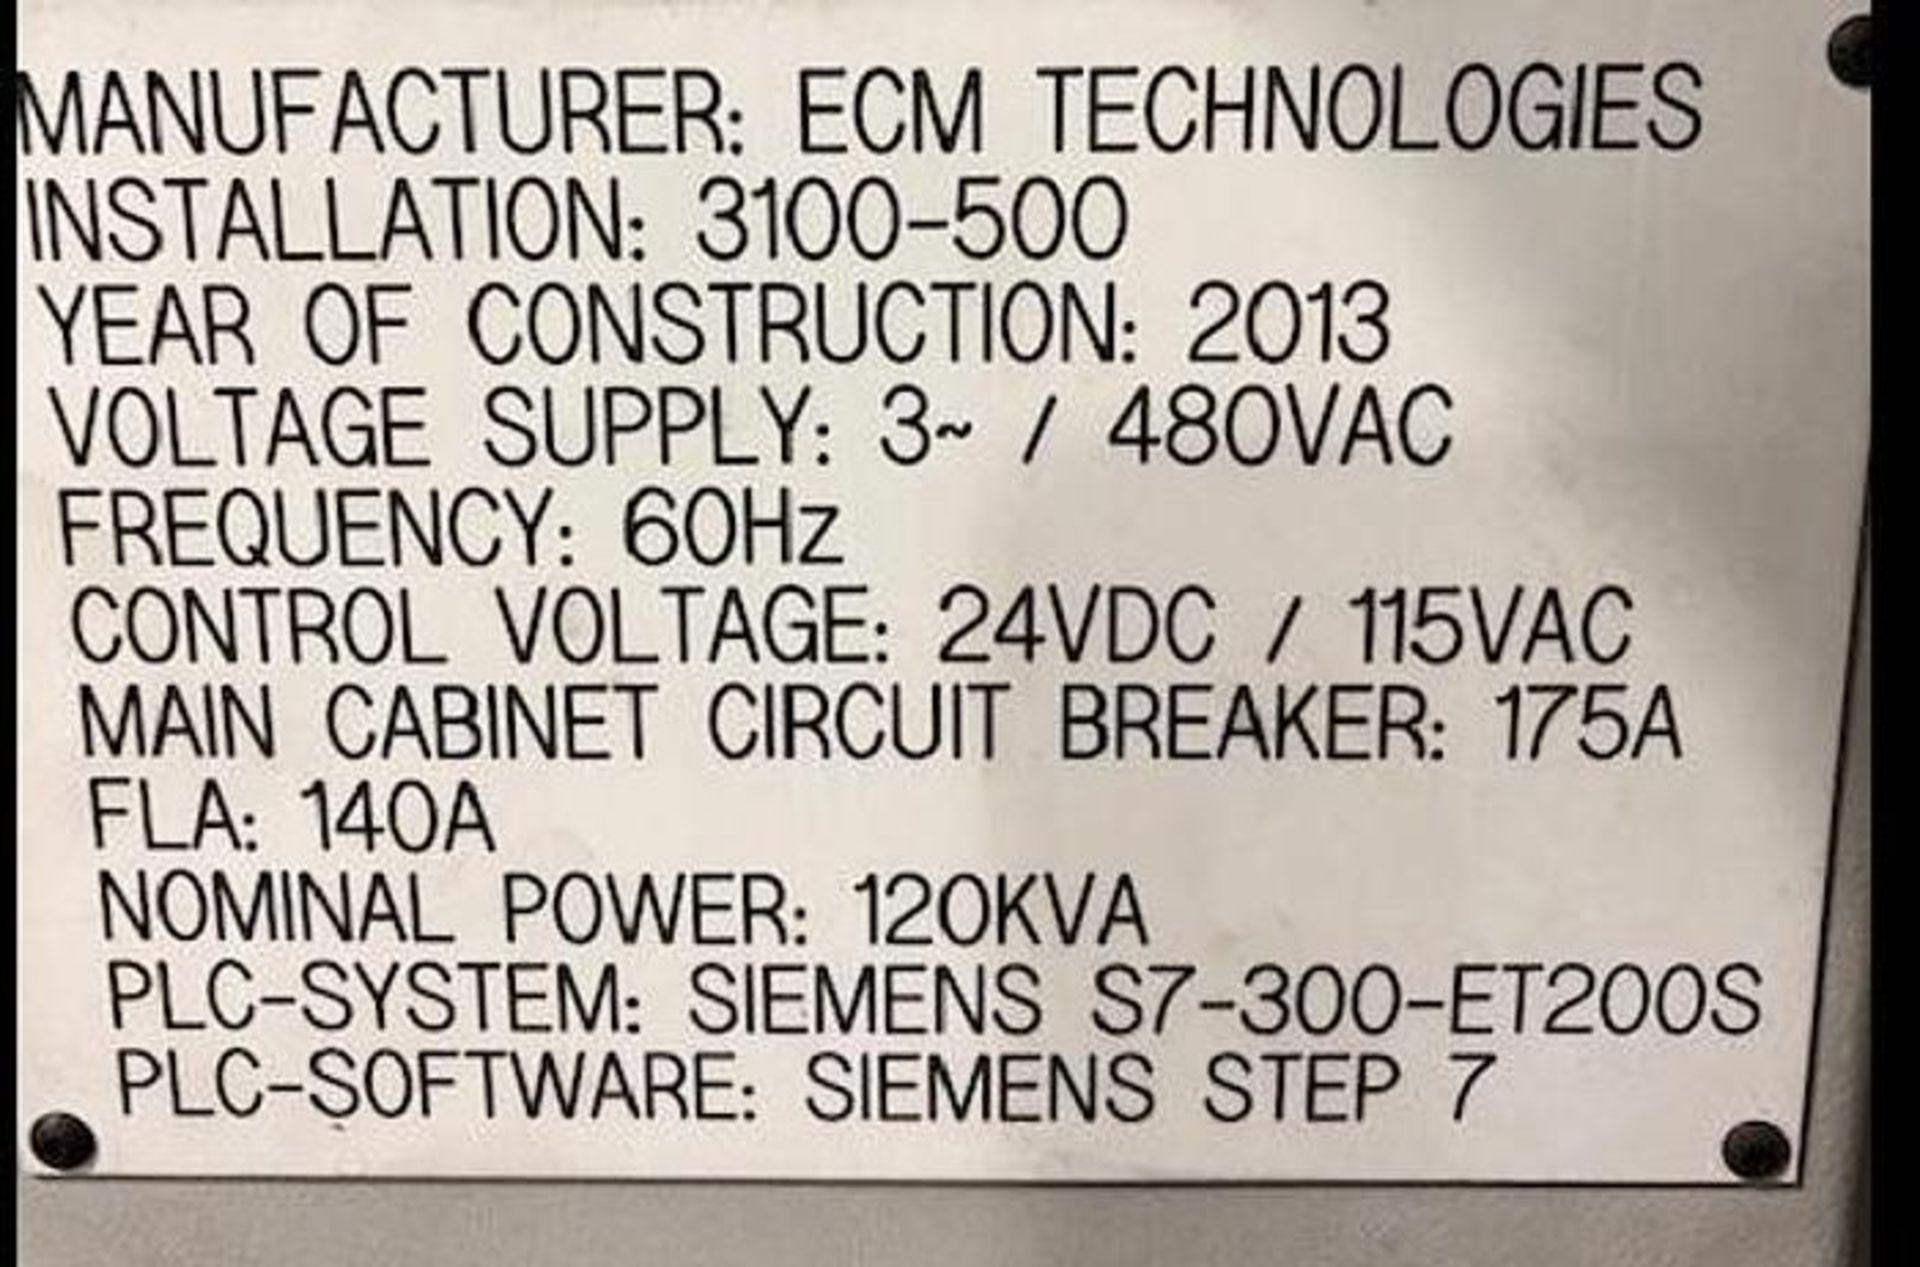 ECM TECHNOLOGIES VACUM CARBURIZING FURNACE, NEW 2013, SN 3100-500 - Image 22 of 50